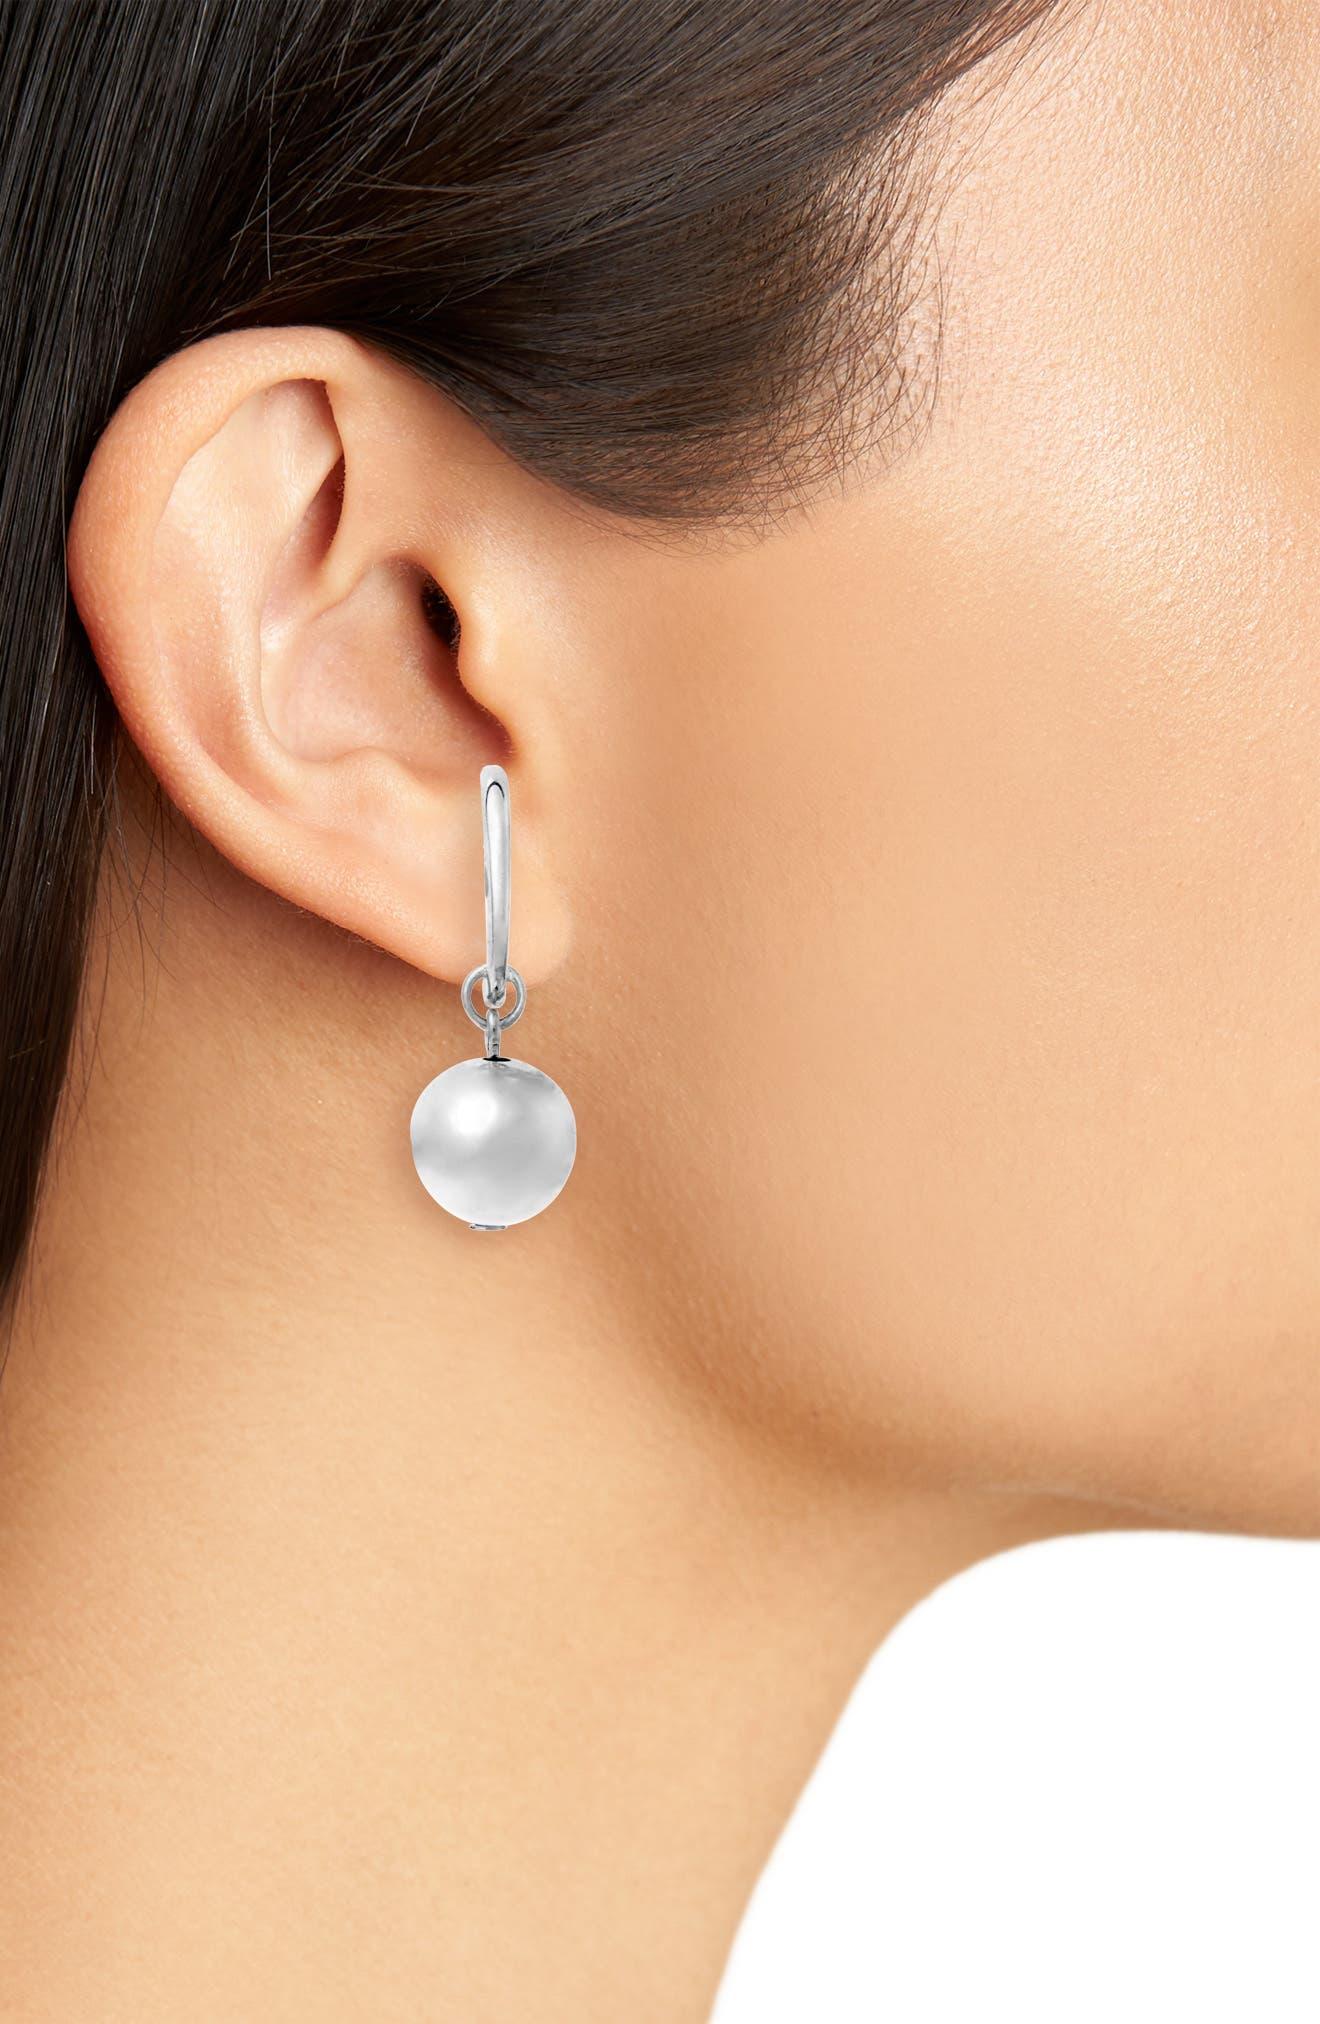 Silver Lobe Drop Earrings,                             Alternate thumbnail 2, color,                             STERLING SILVER